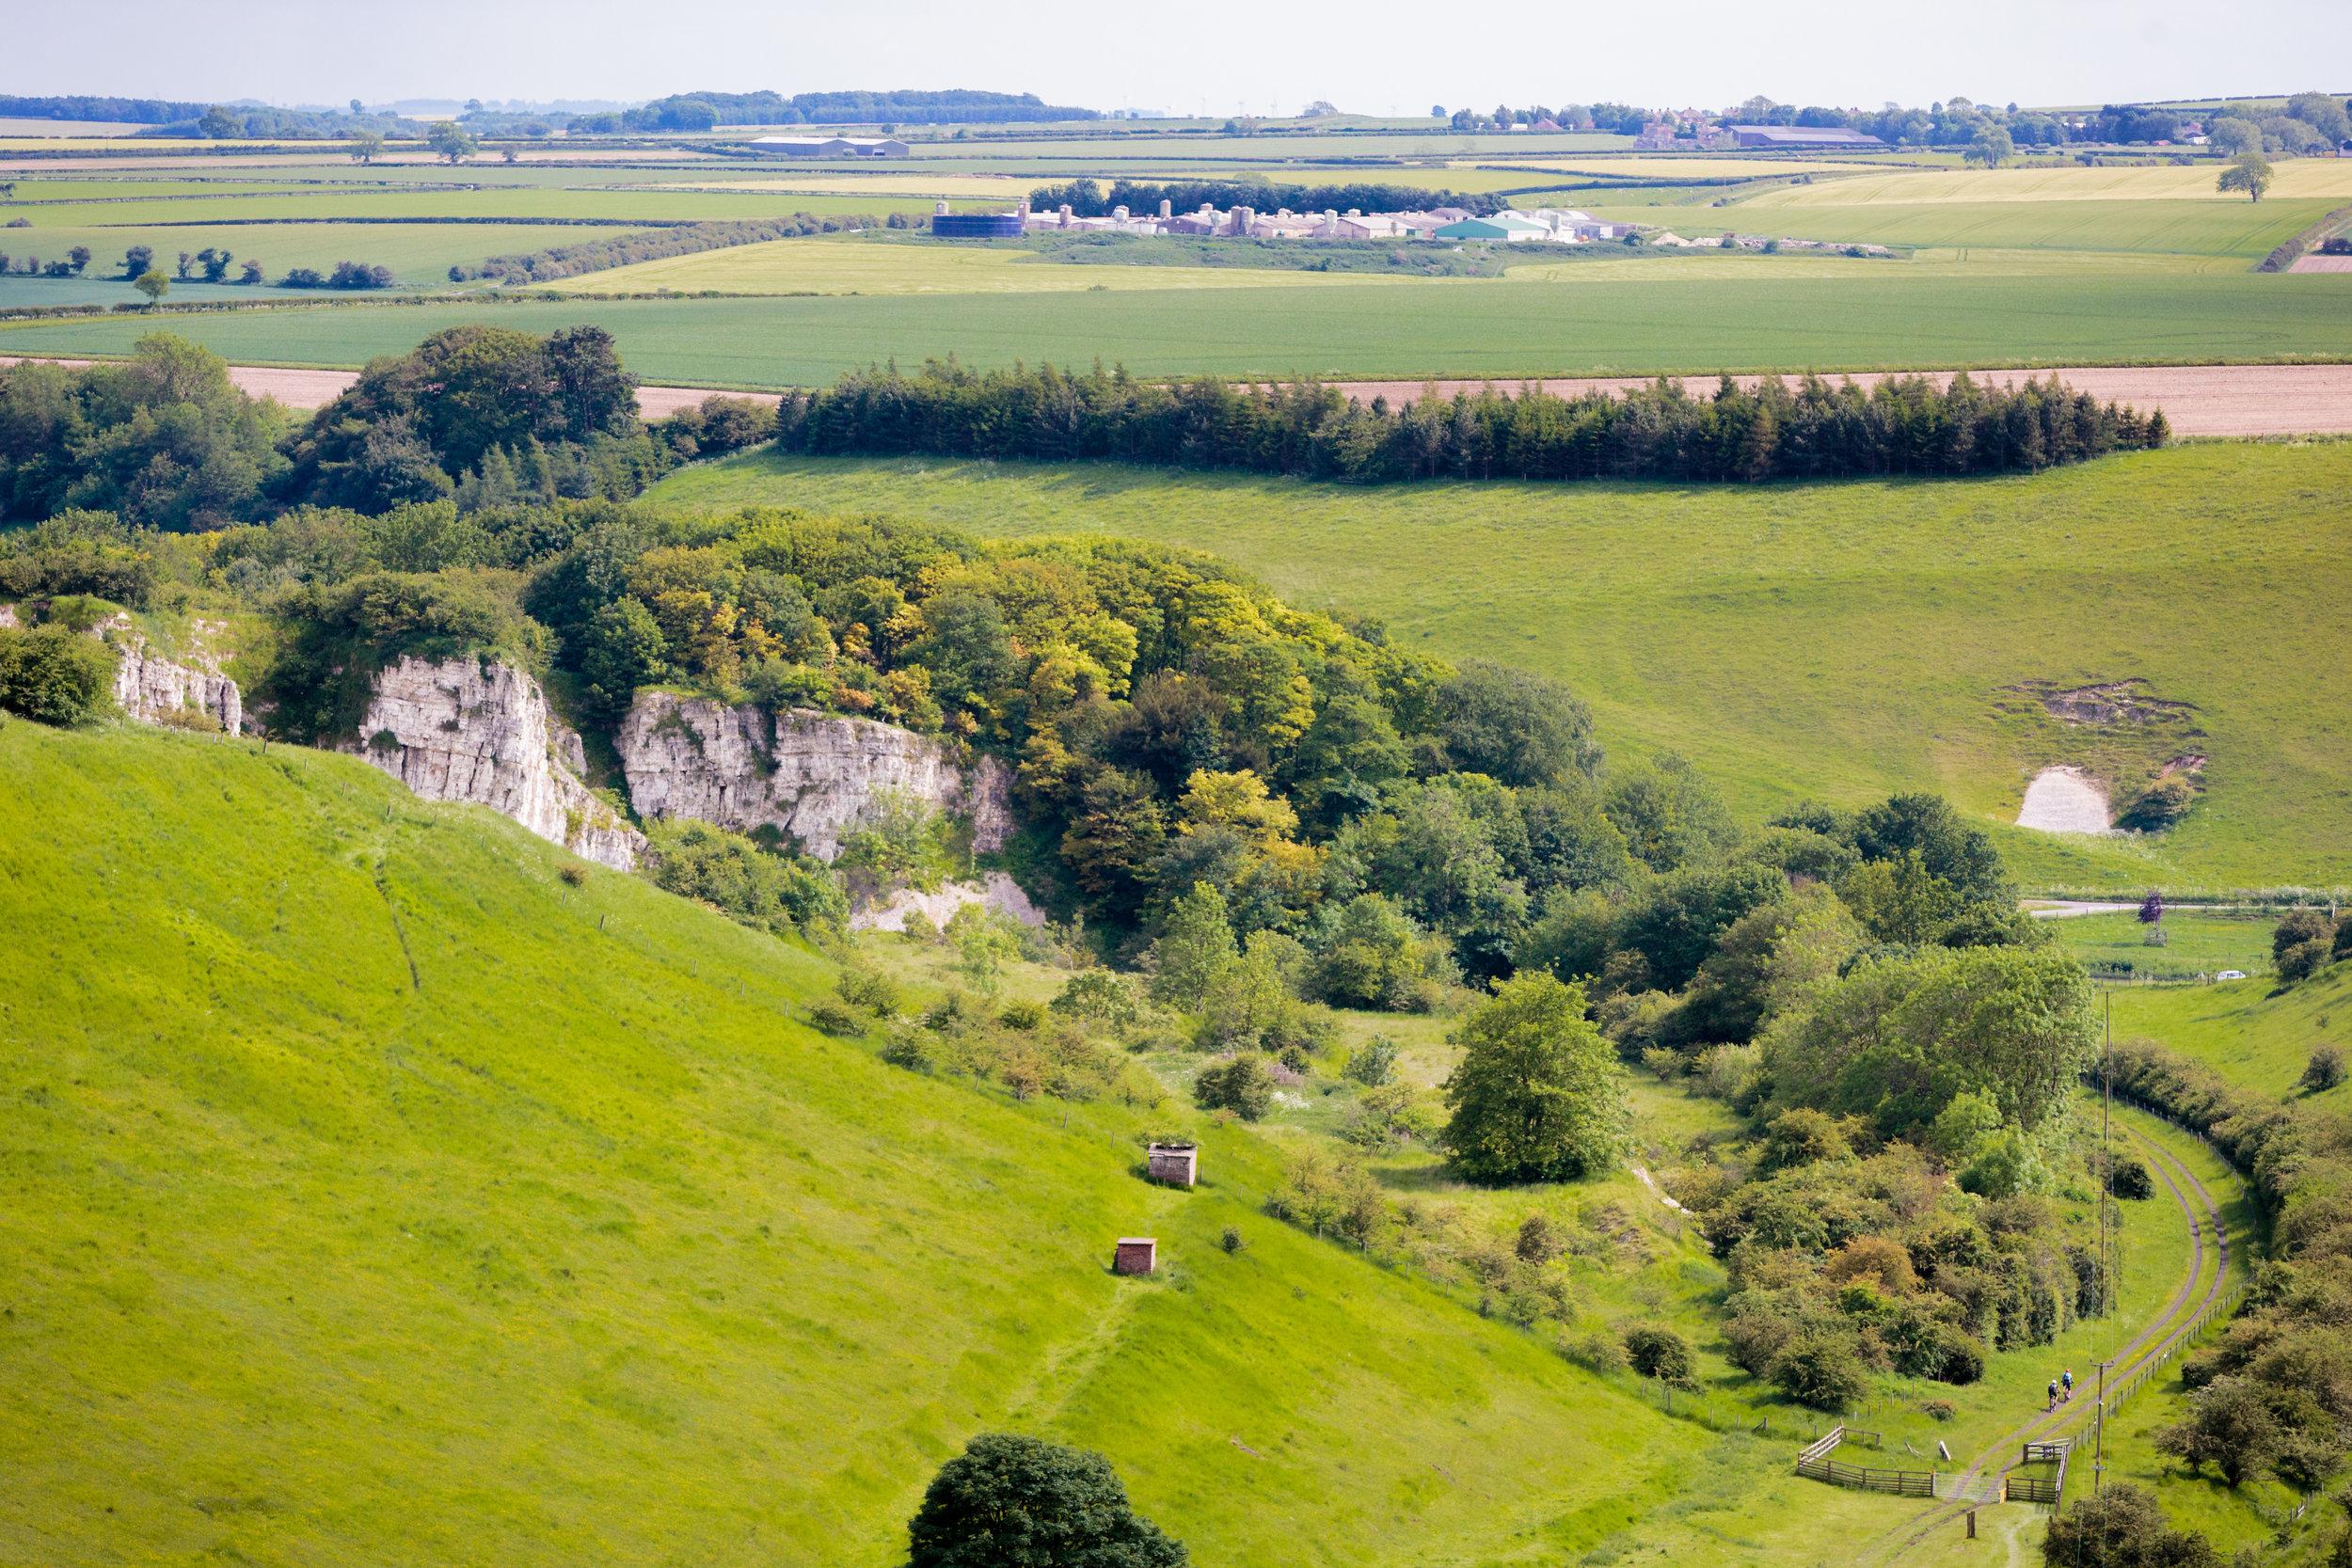 Bic Yorkshire Scenery.  Small Mountain Bikers.